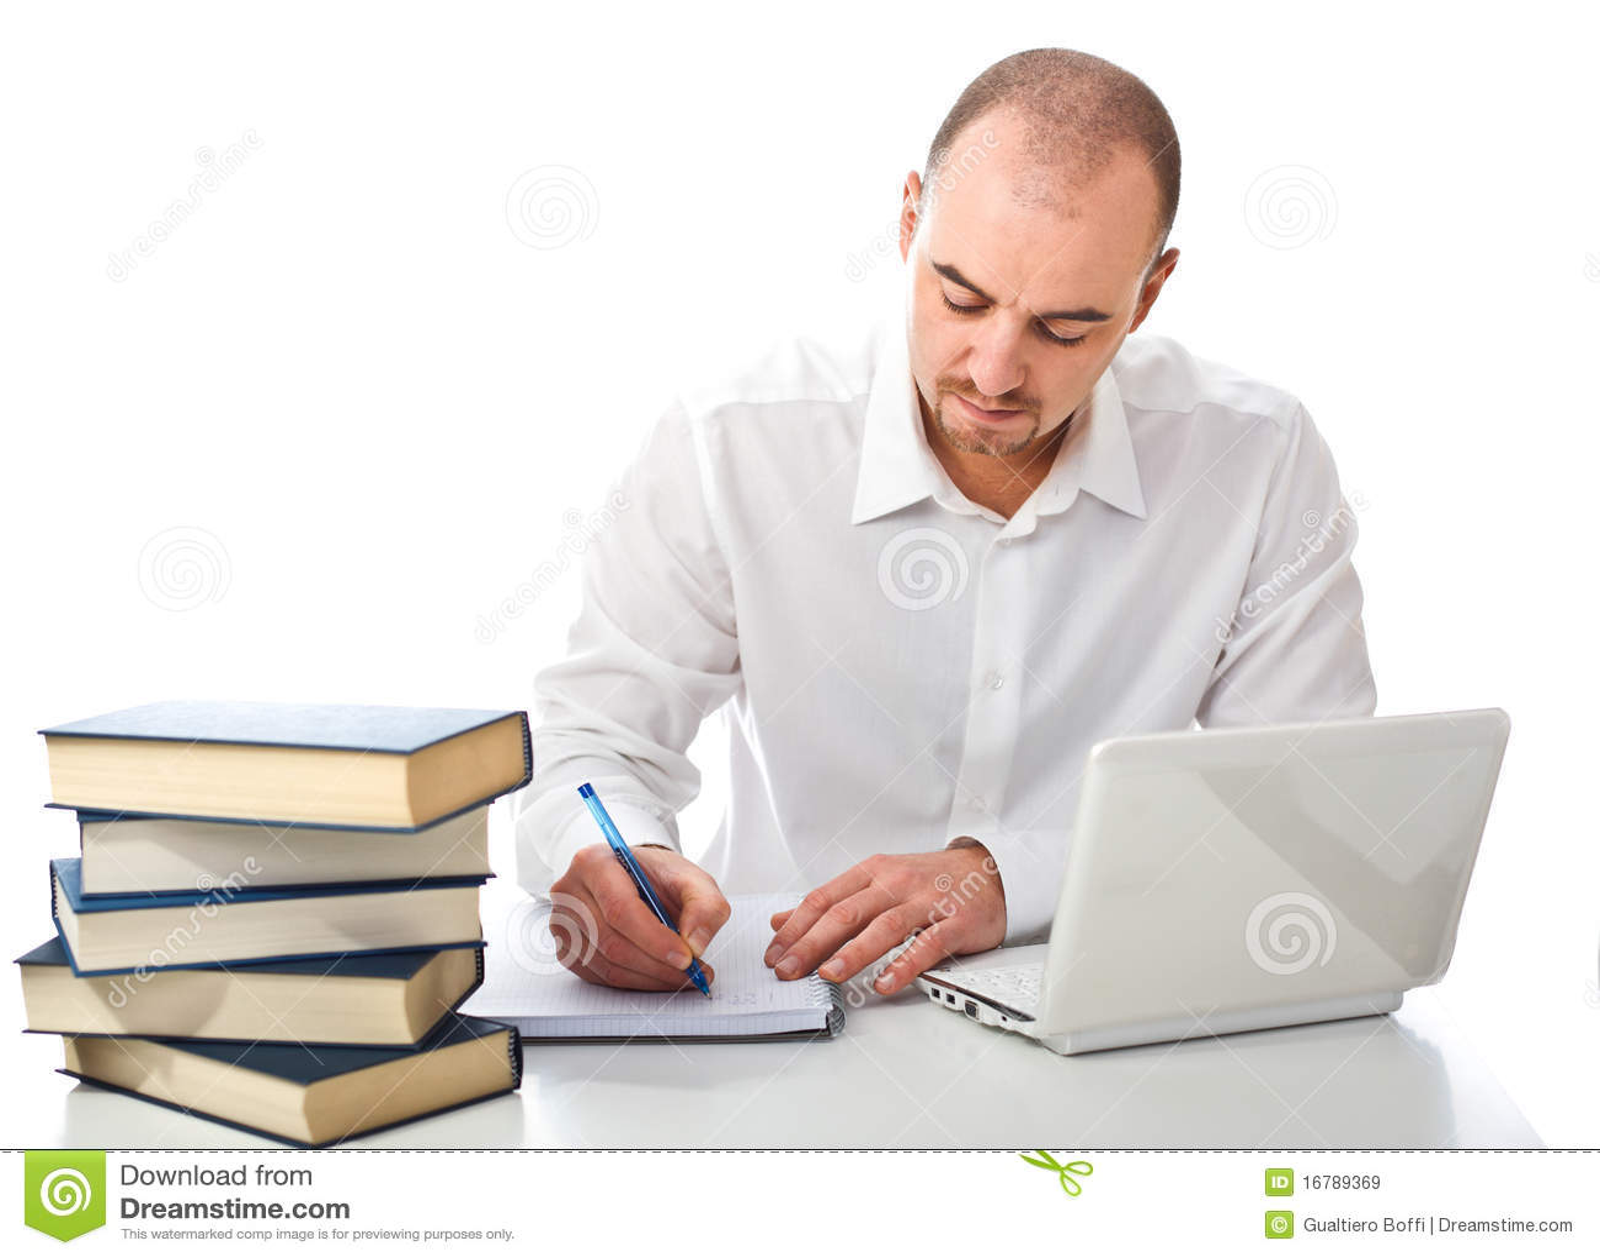 Graduate level essay writing